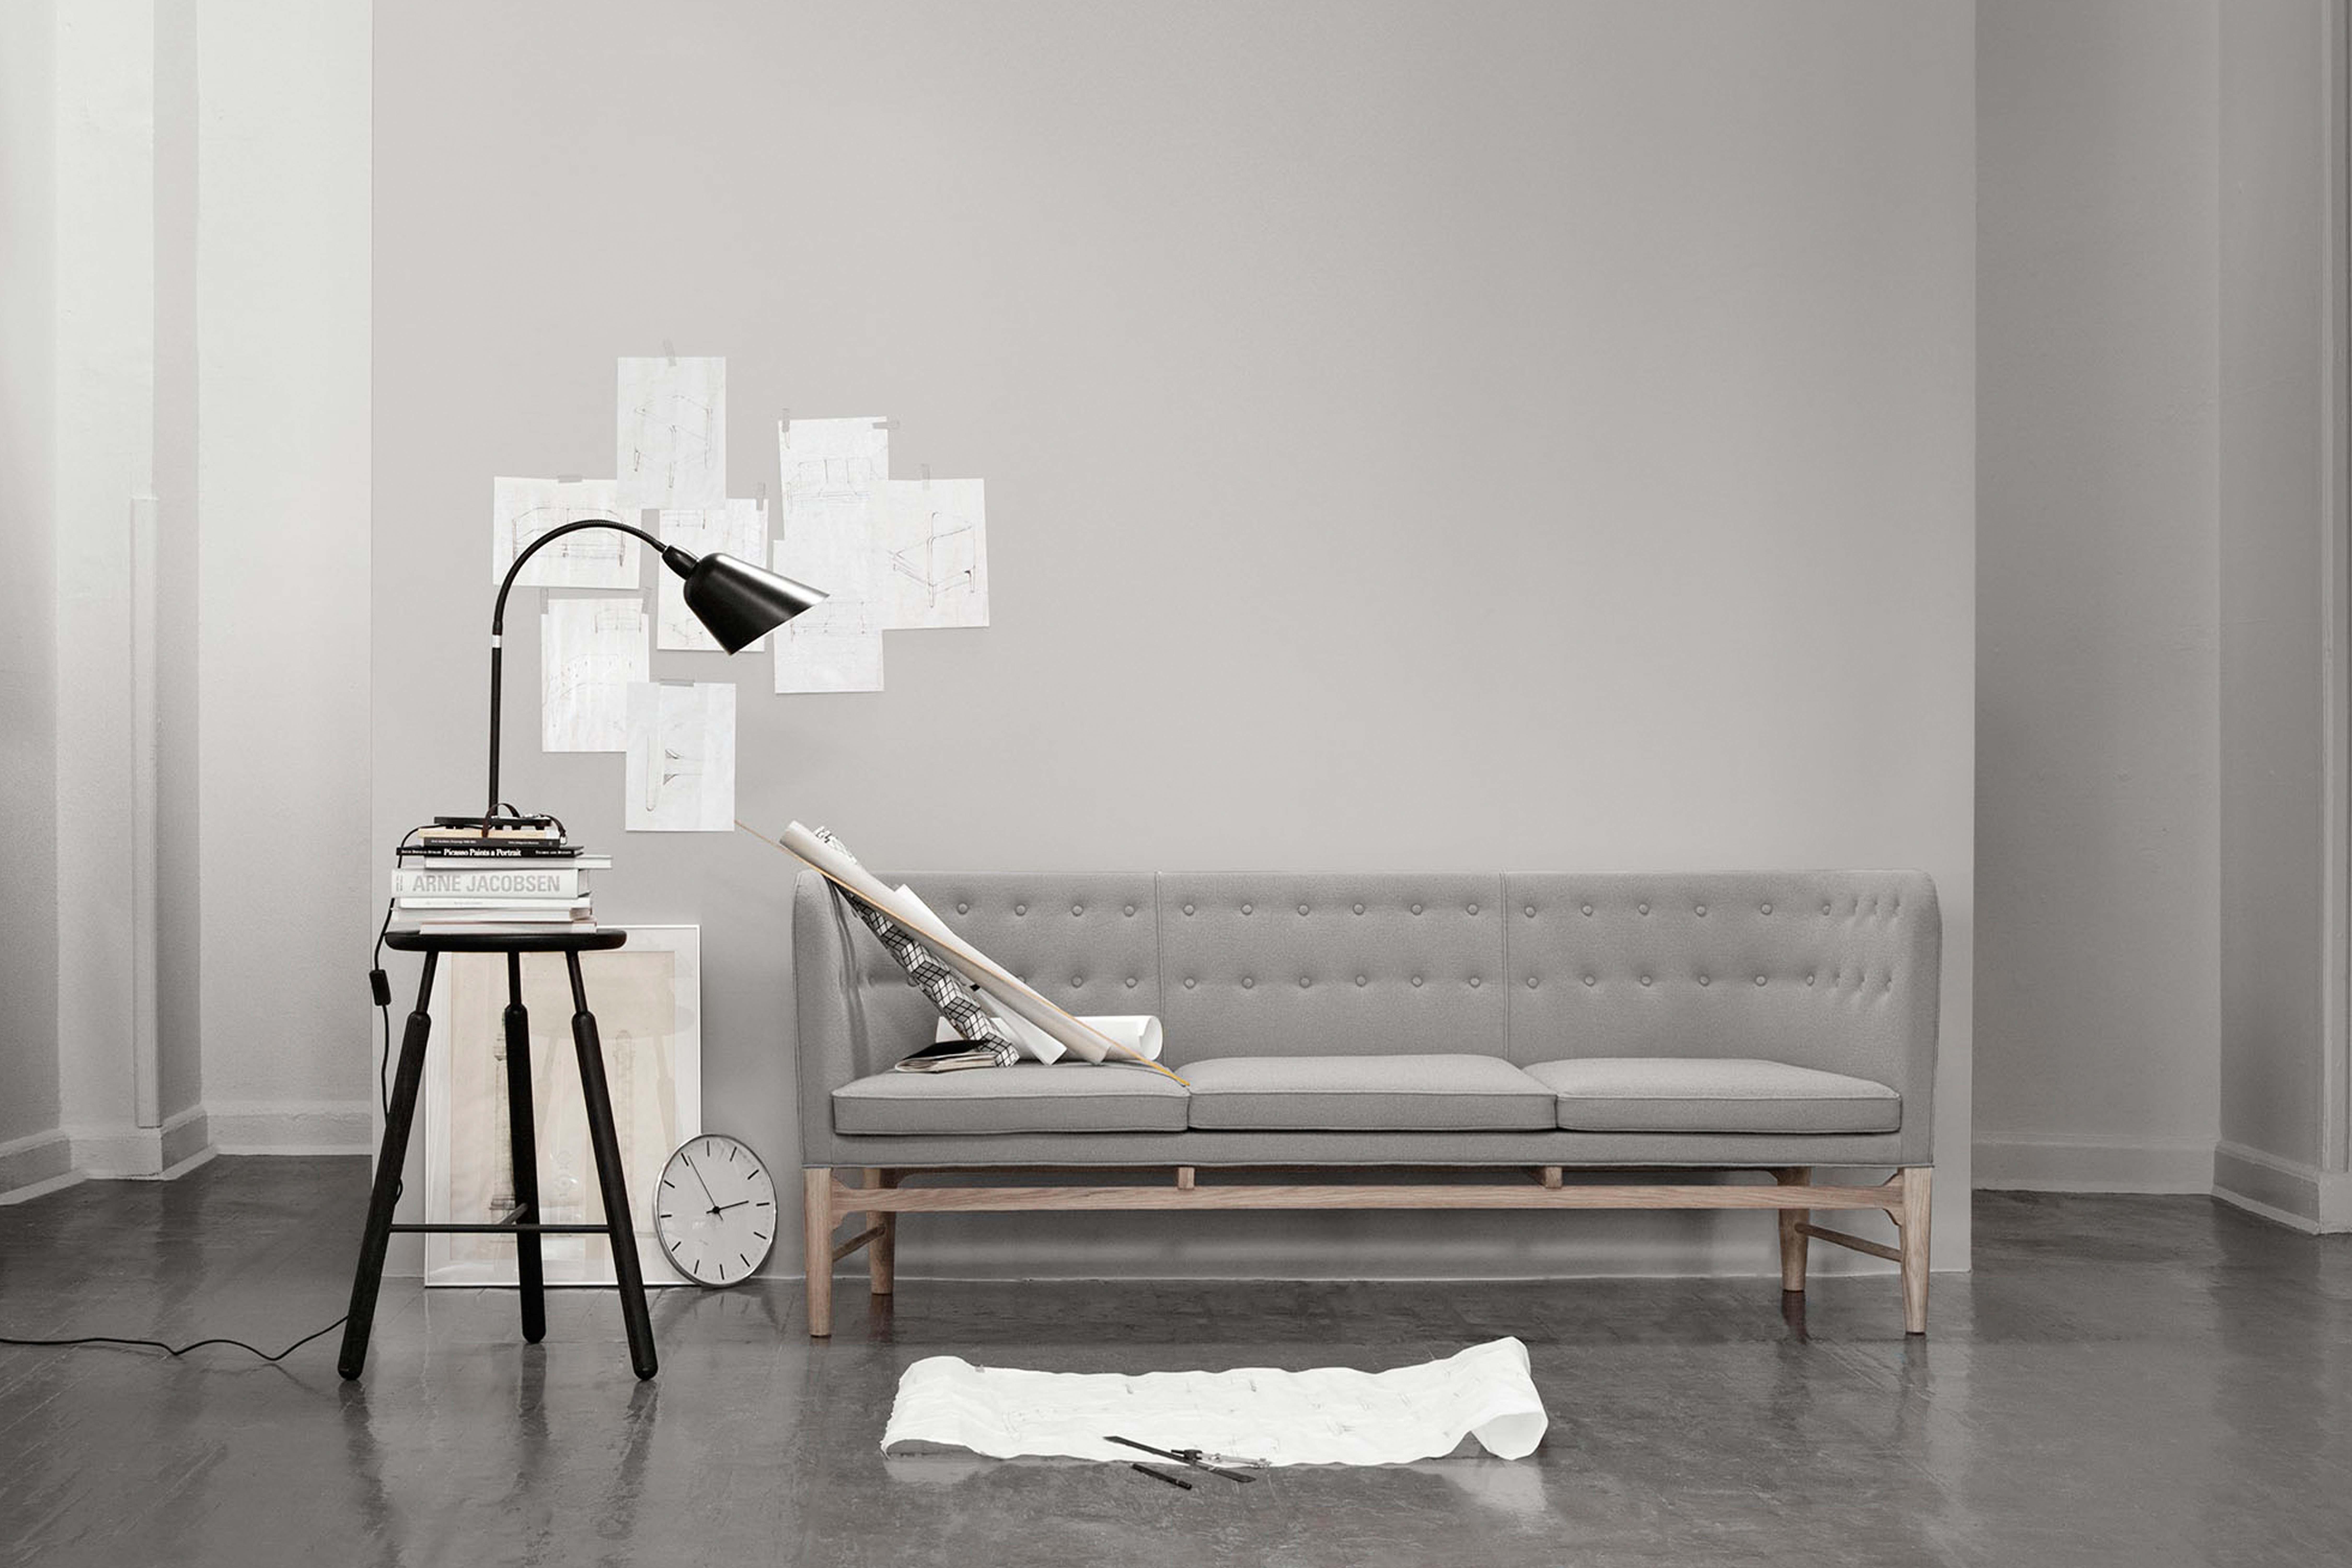 and tradition productos de dise o en gunni trentino. Black Bedroom Furniture Sets. Home Design Ideas